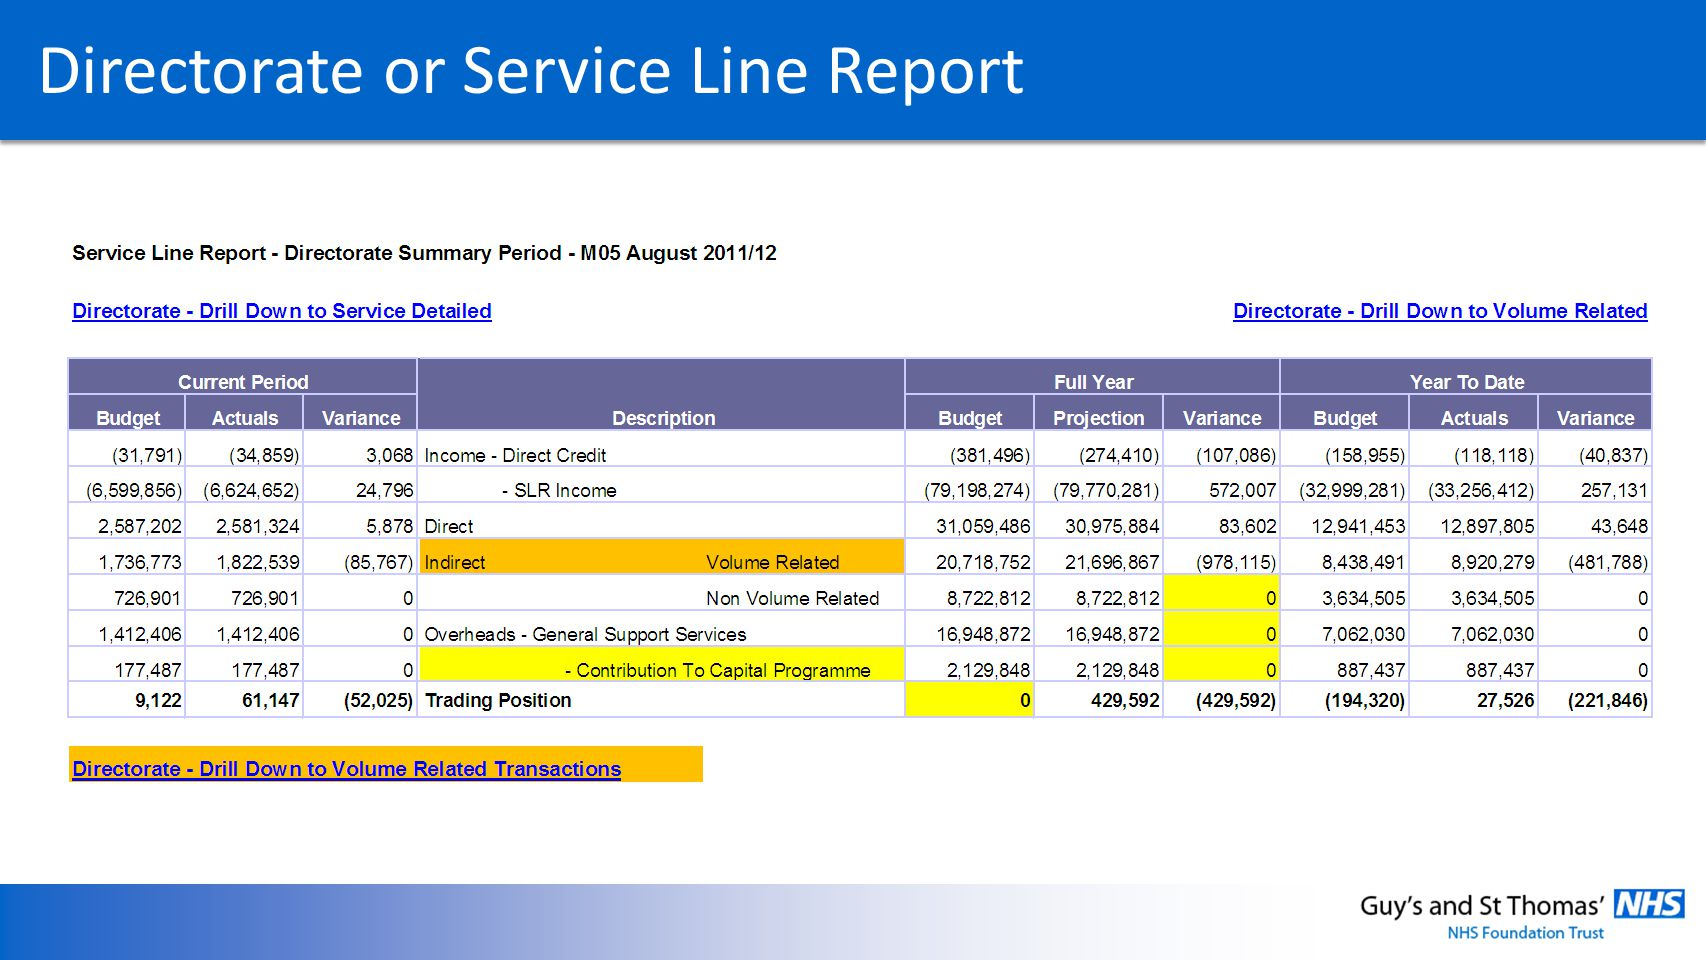 Directorate or Service Line Report